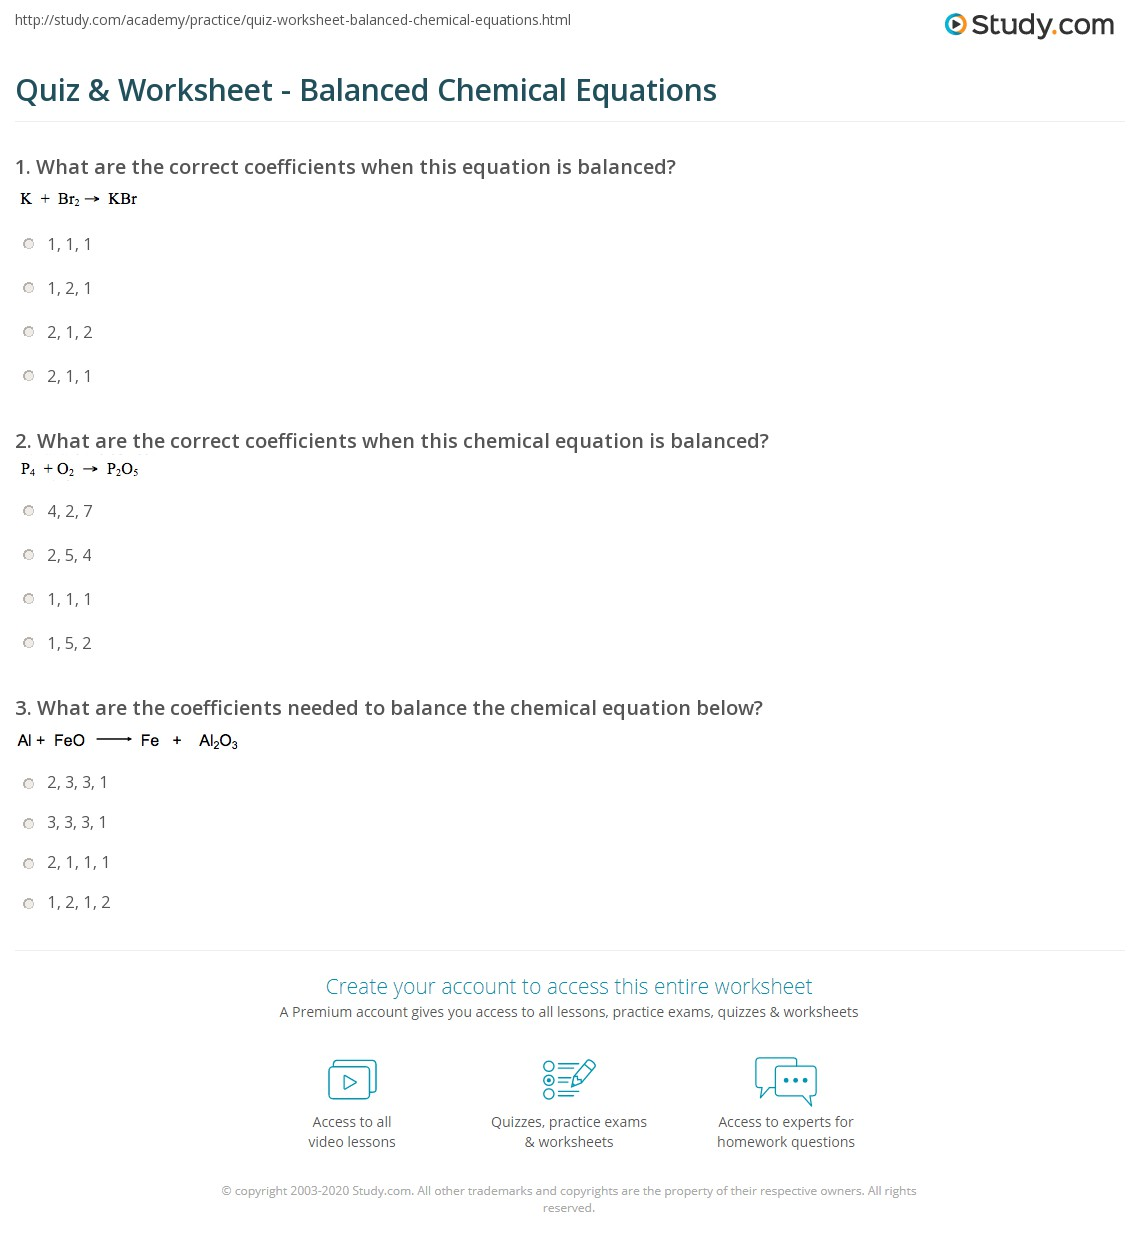 hight resolution of Quiz \u0026 Worksheet - Balanced Chemical Equations   Study.com